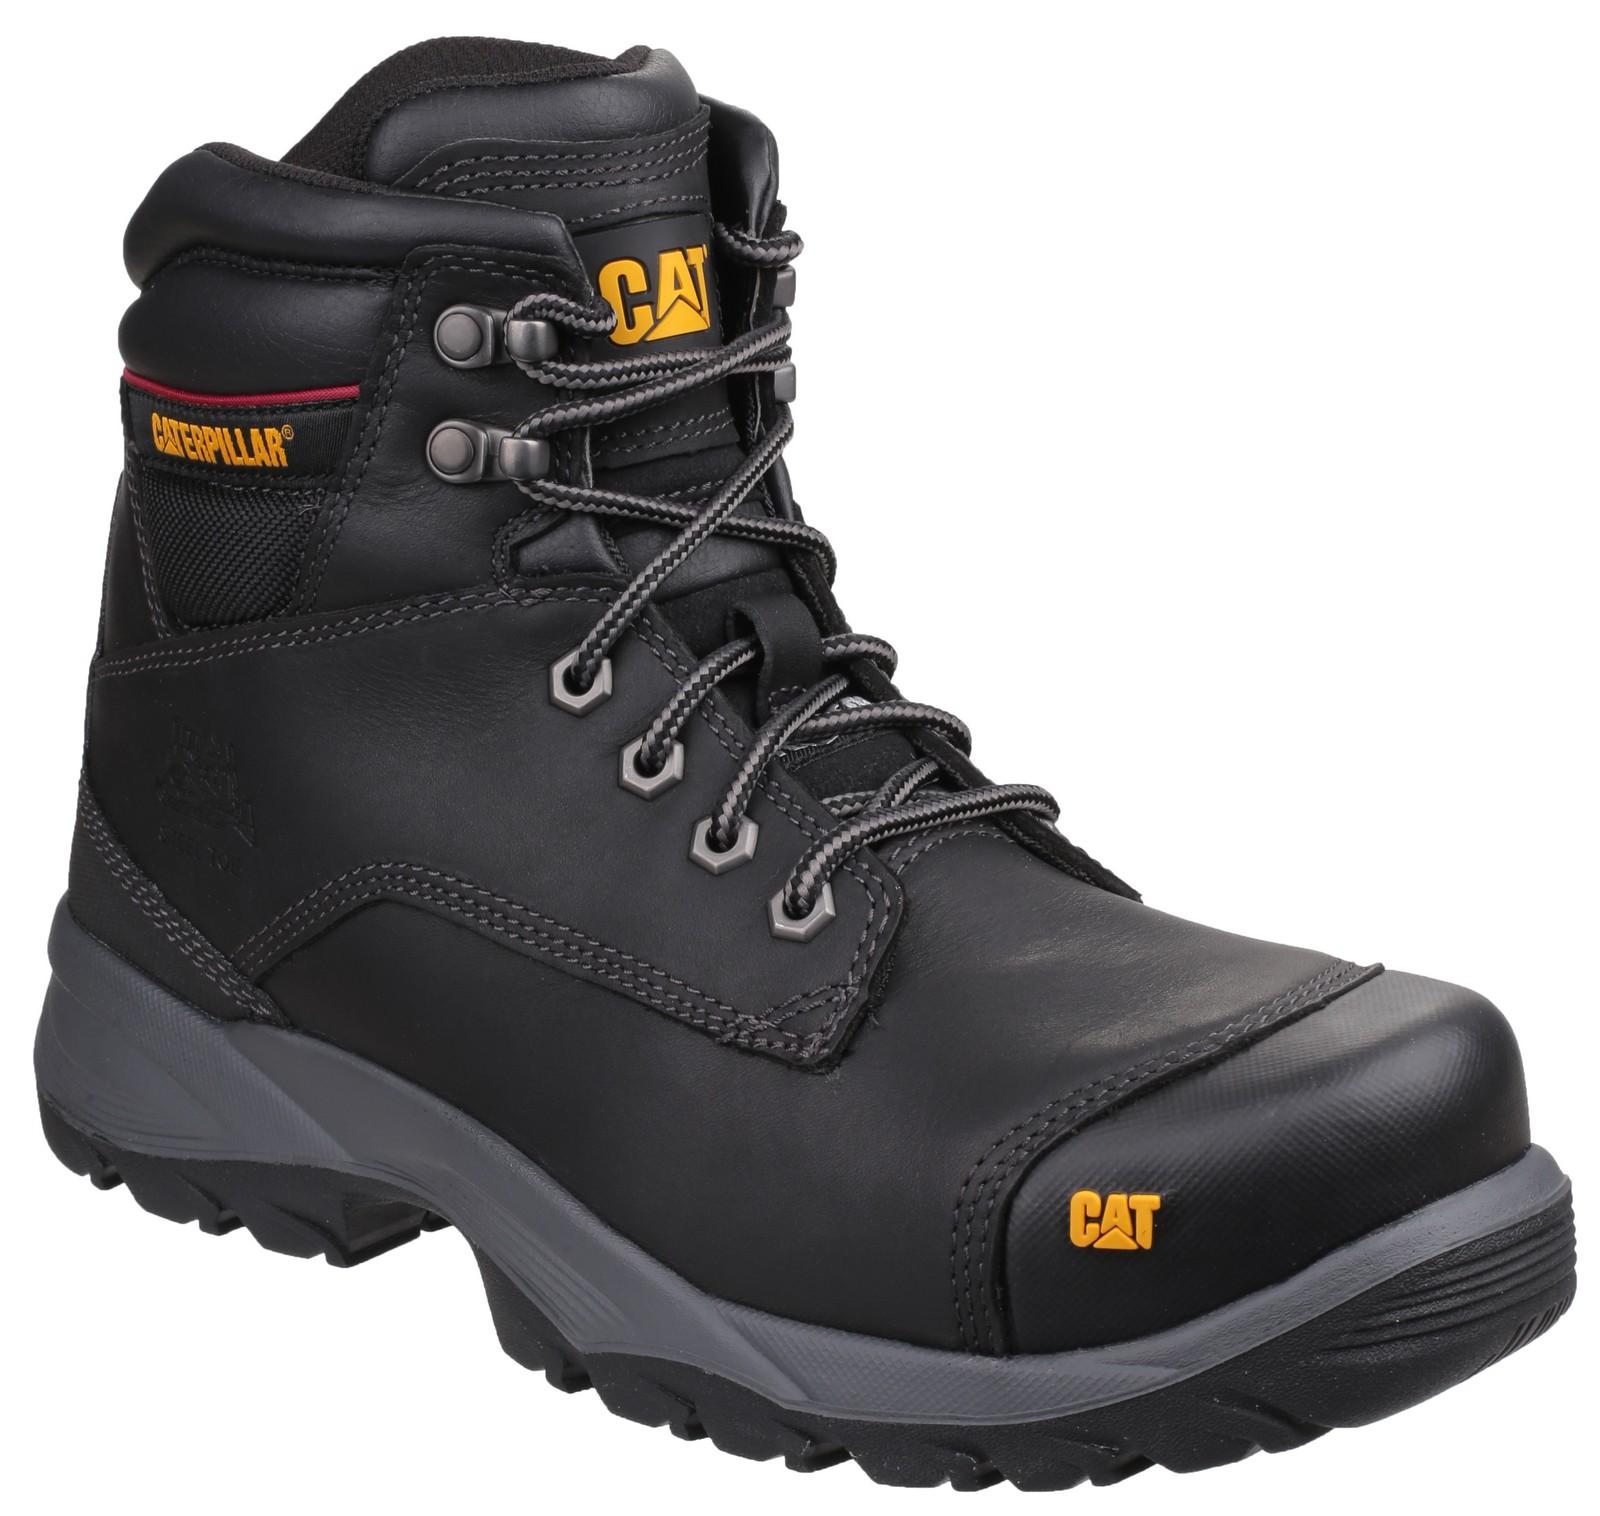 f91b9f6d23b Caterpillar Safety Boots Spiro (Black)